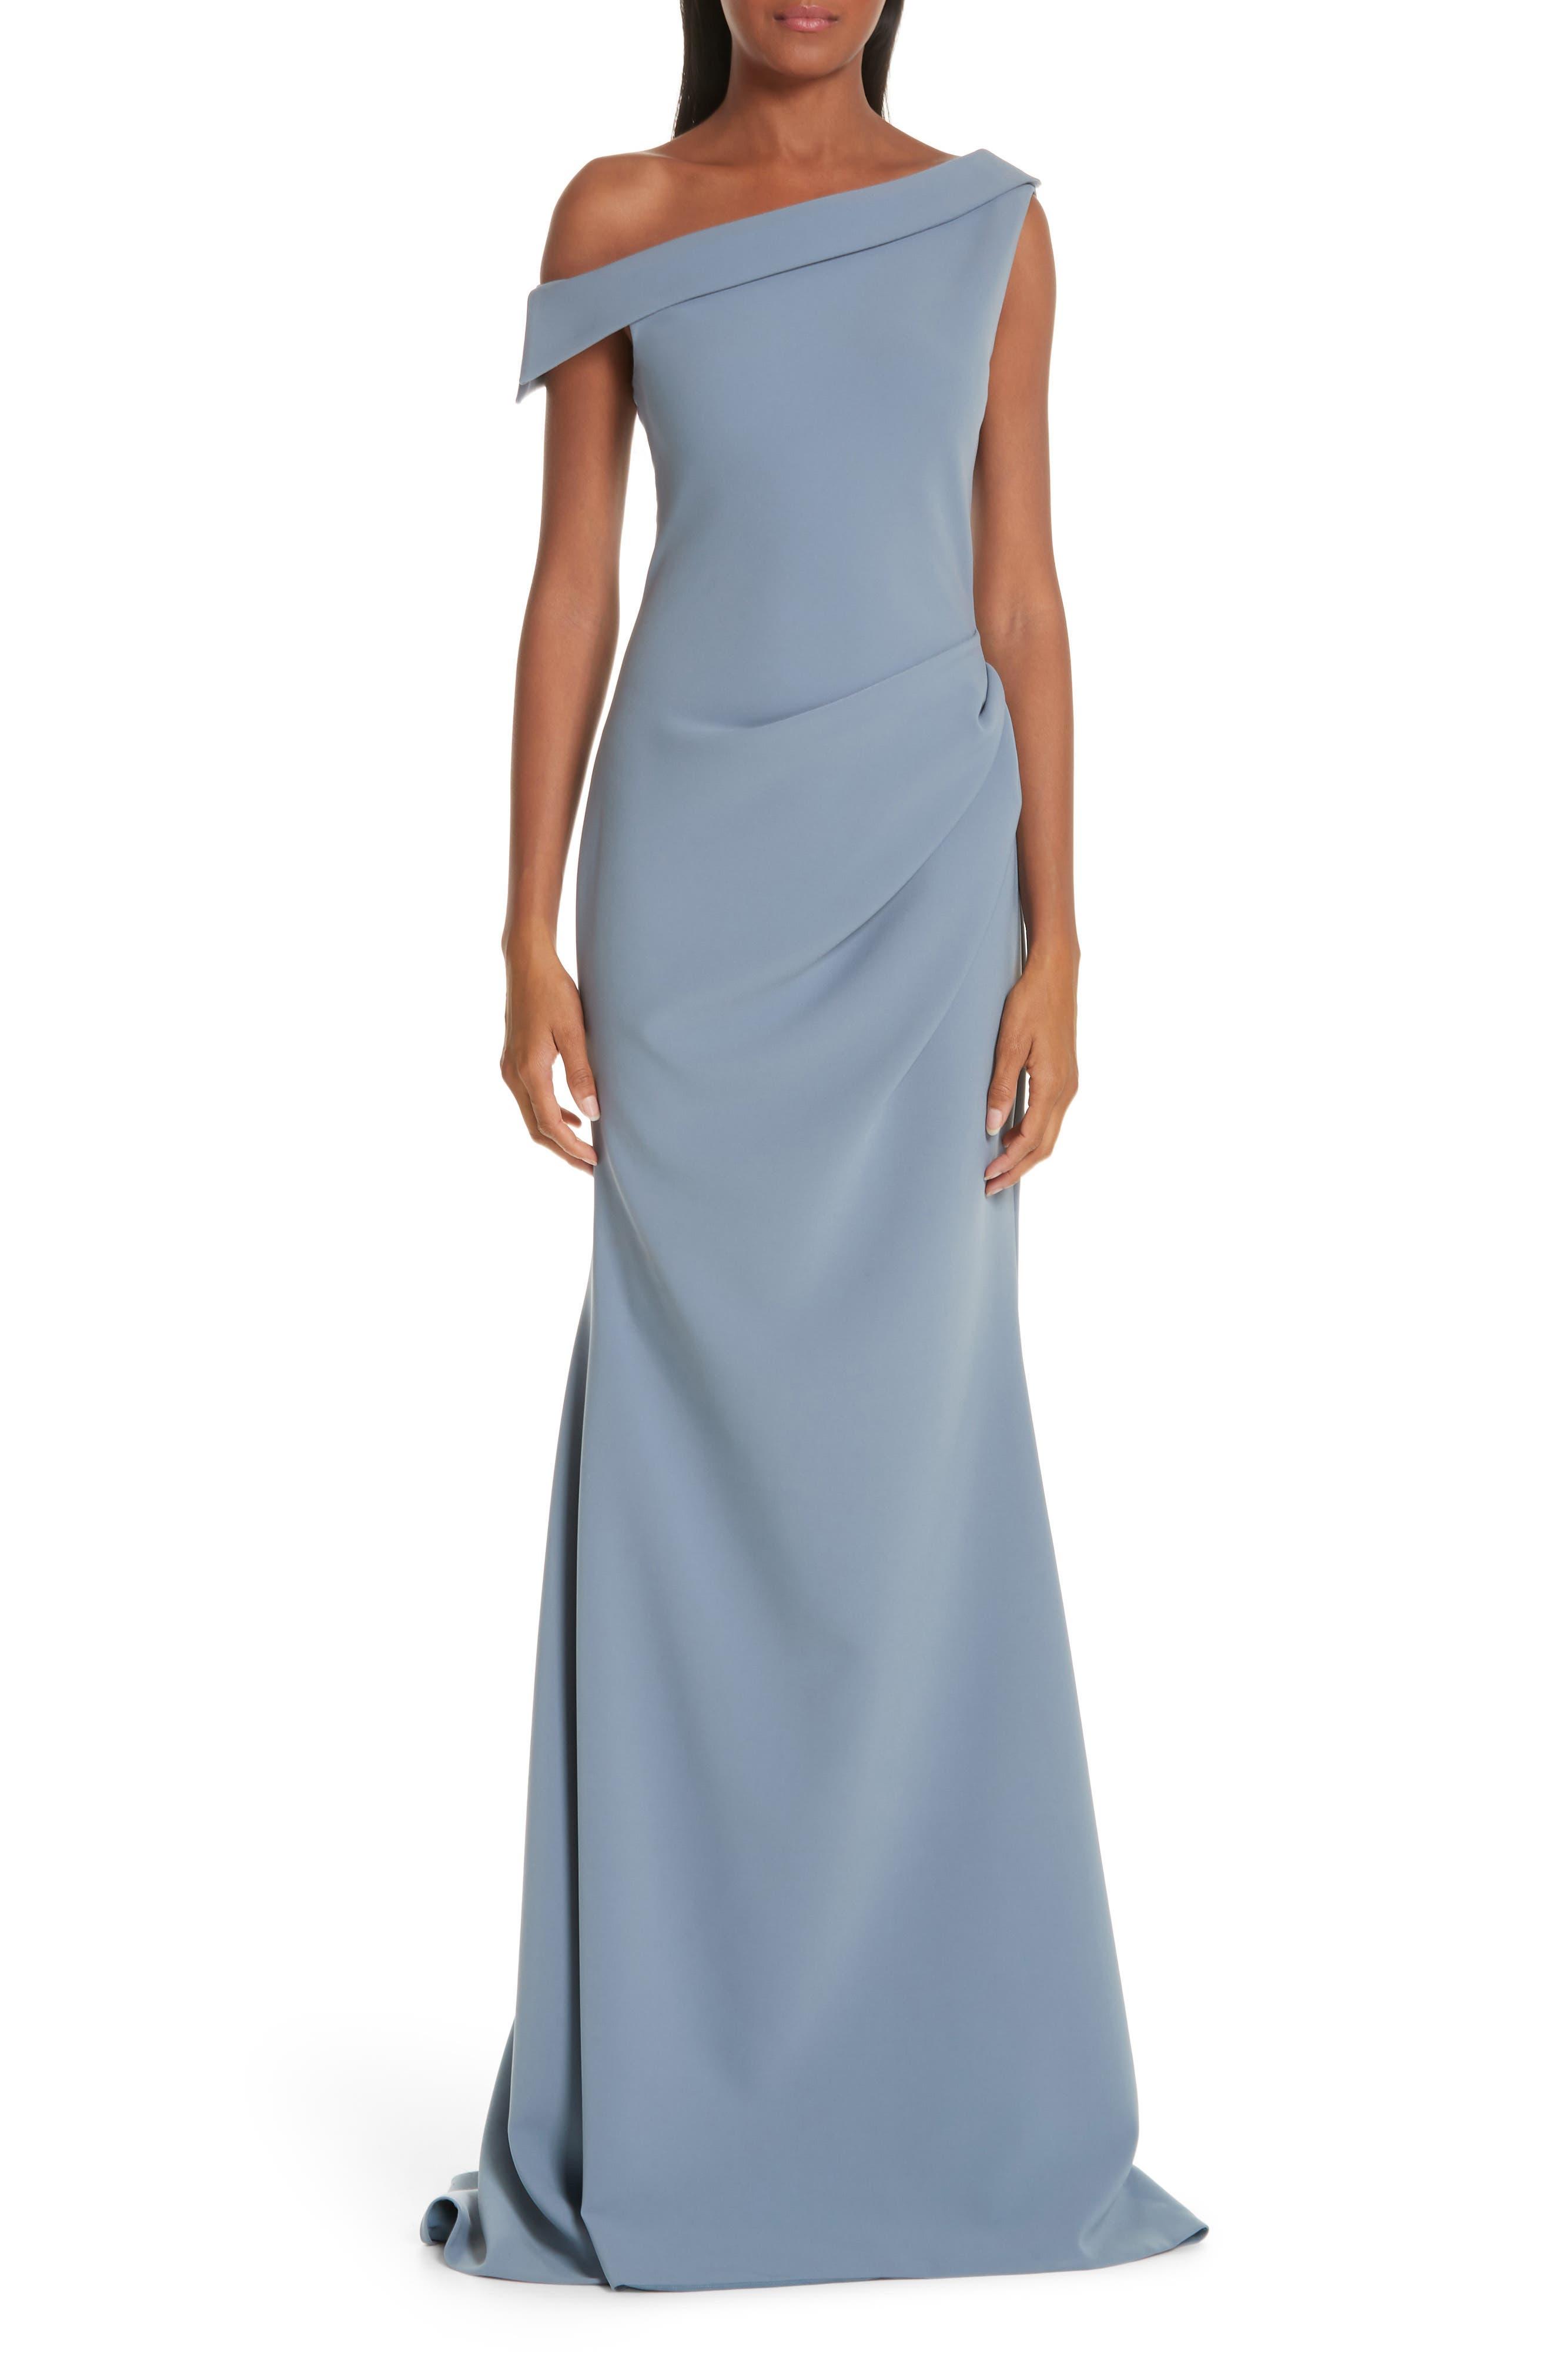 Christian Siriano One-Shoulder Evening Dress, (fits like 8) - Blue